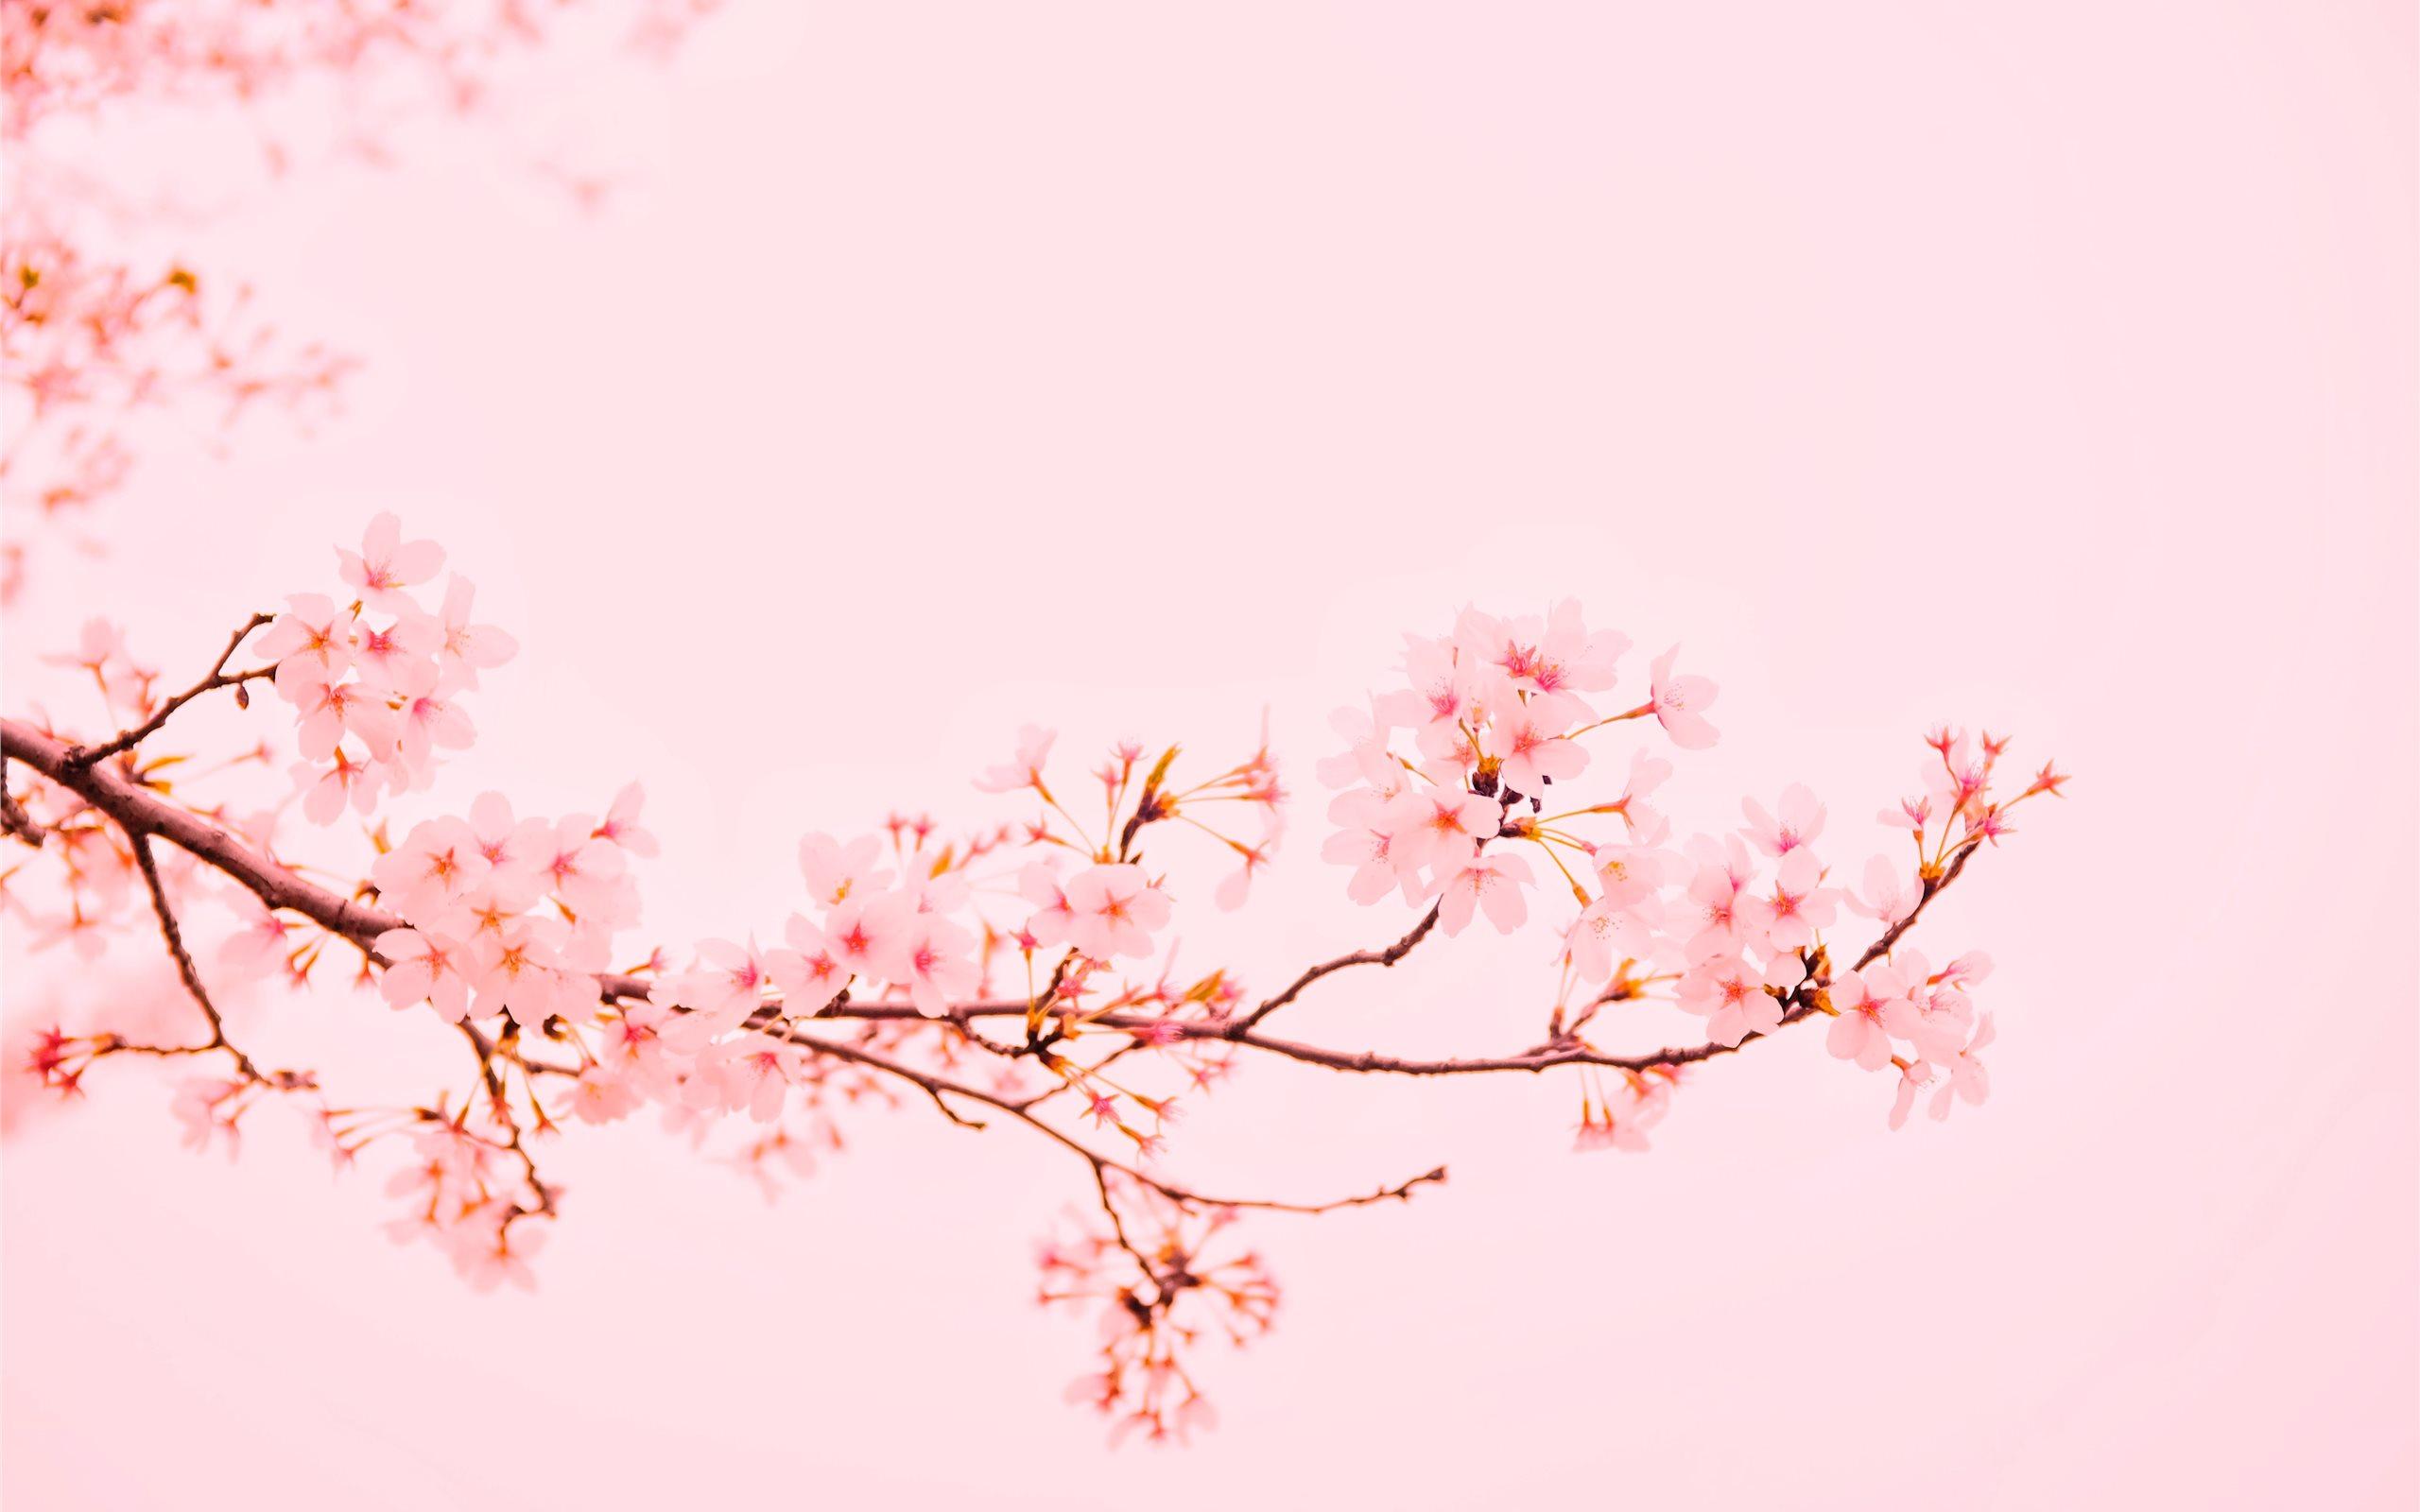 Pastel Aesthetic Cherry Blossom Wallpaper Hd Desktop 2560x1600 Wallpaper Teahub Io